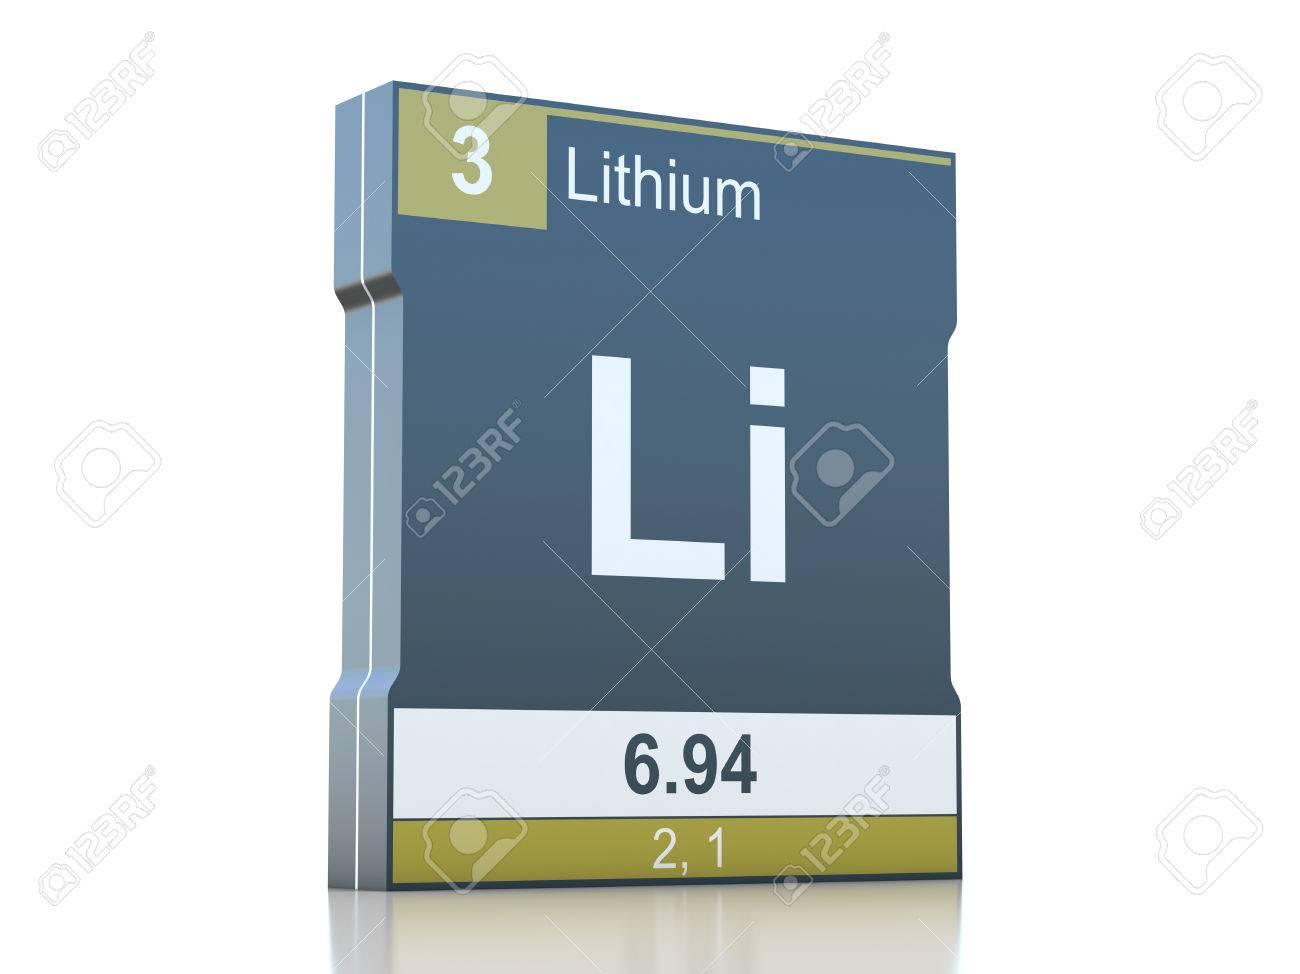 foto de archivo smbolo de litio elemento de la tabla peridica - Tabla Periodica Litio